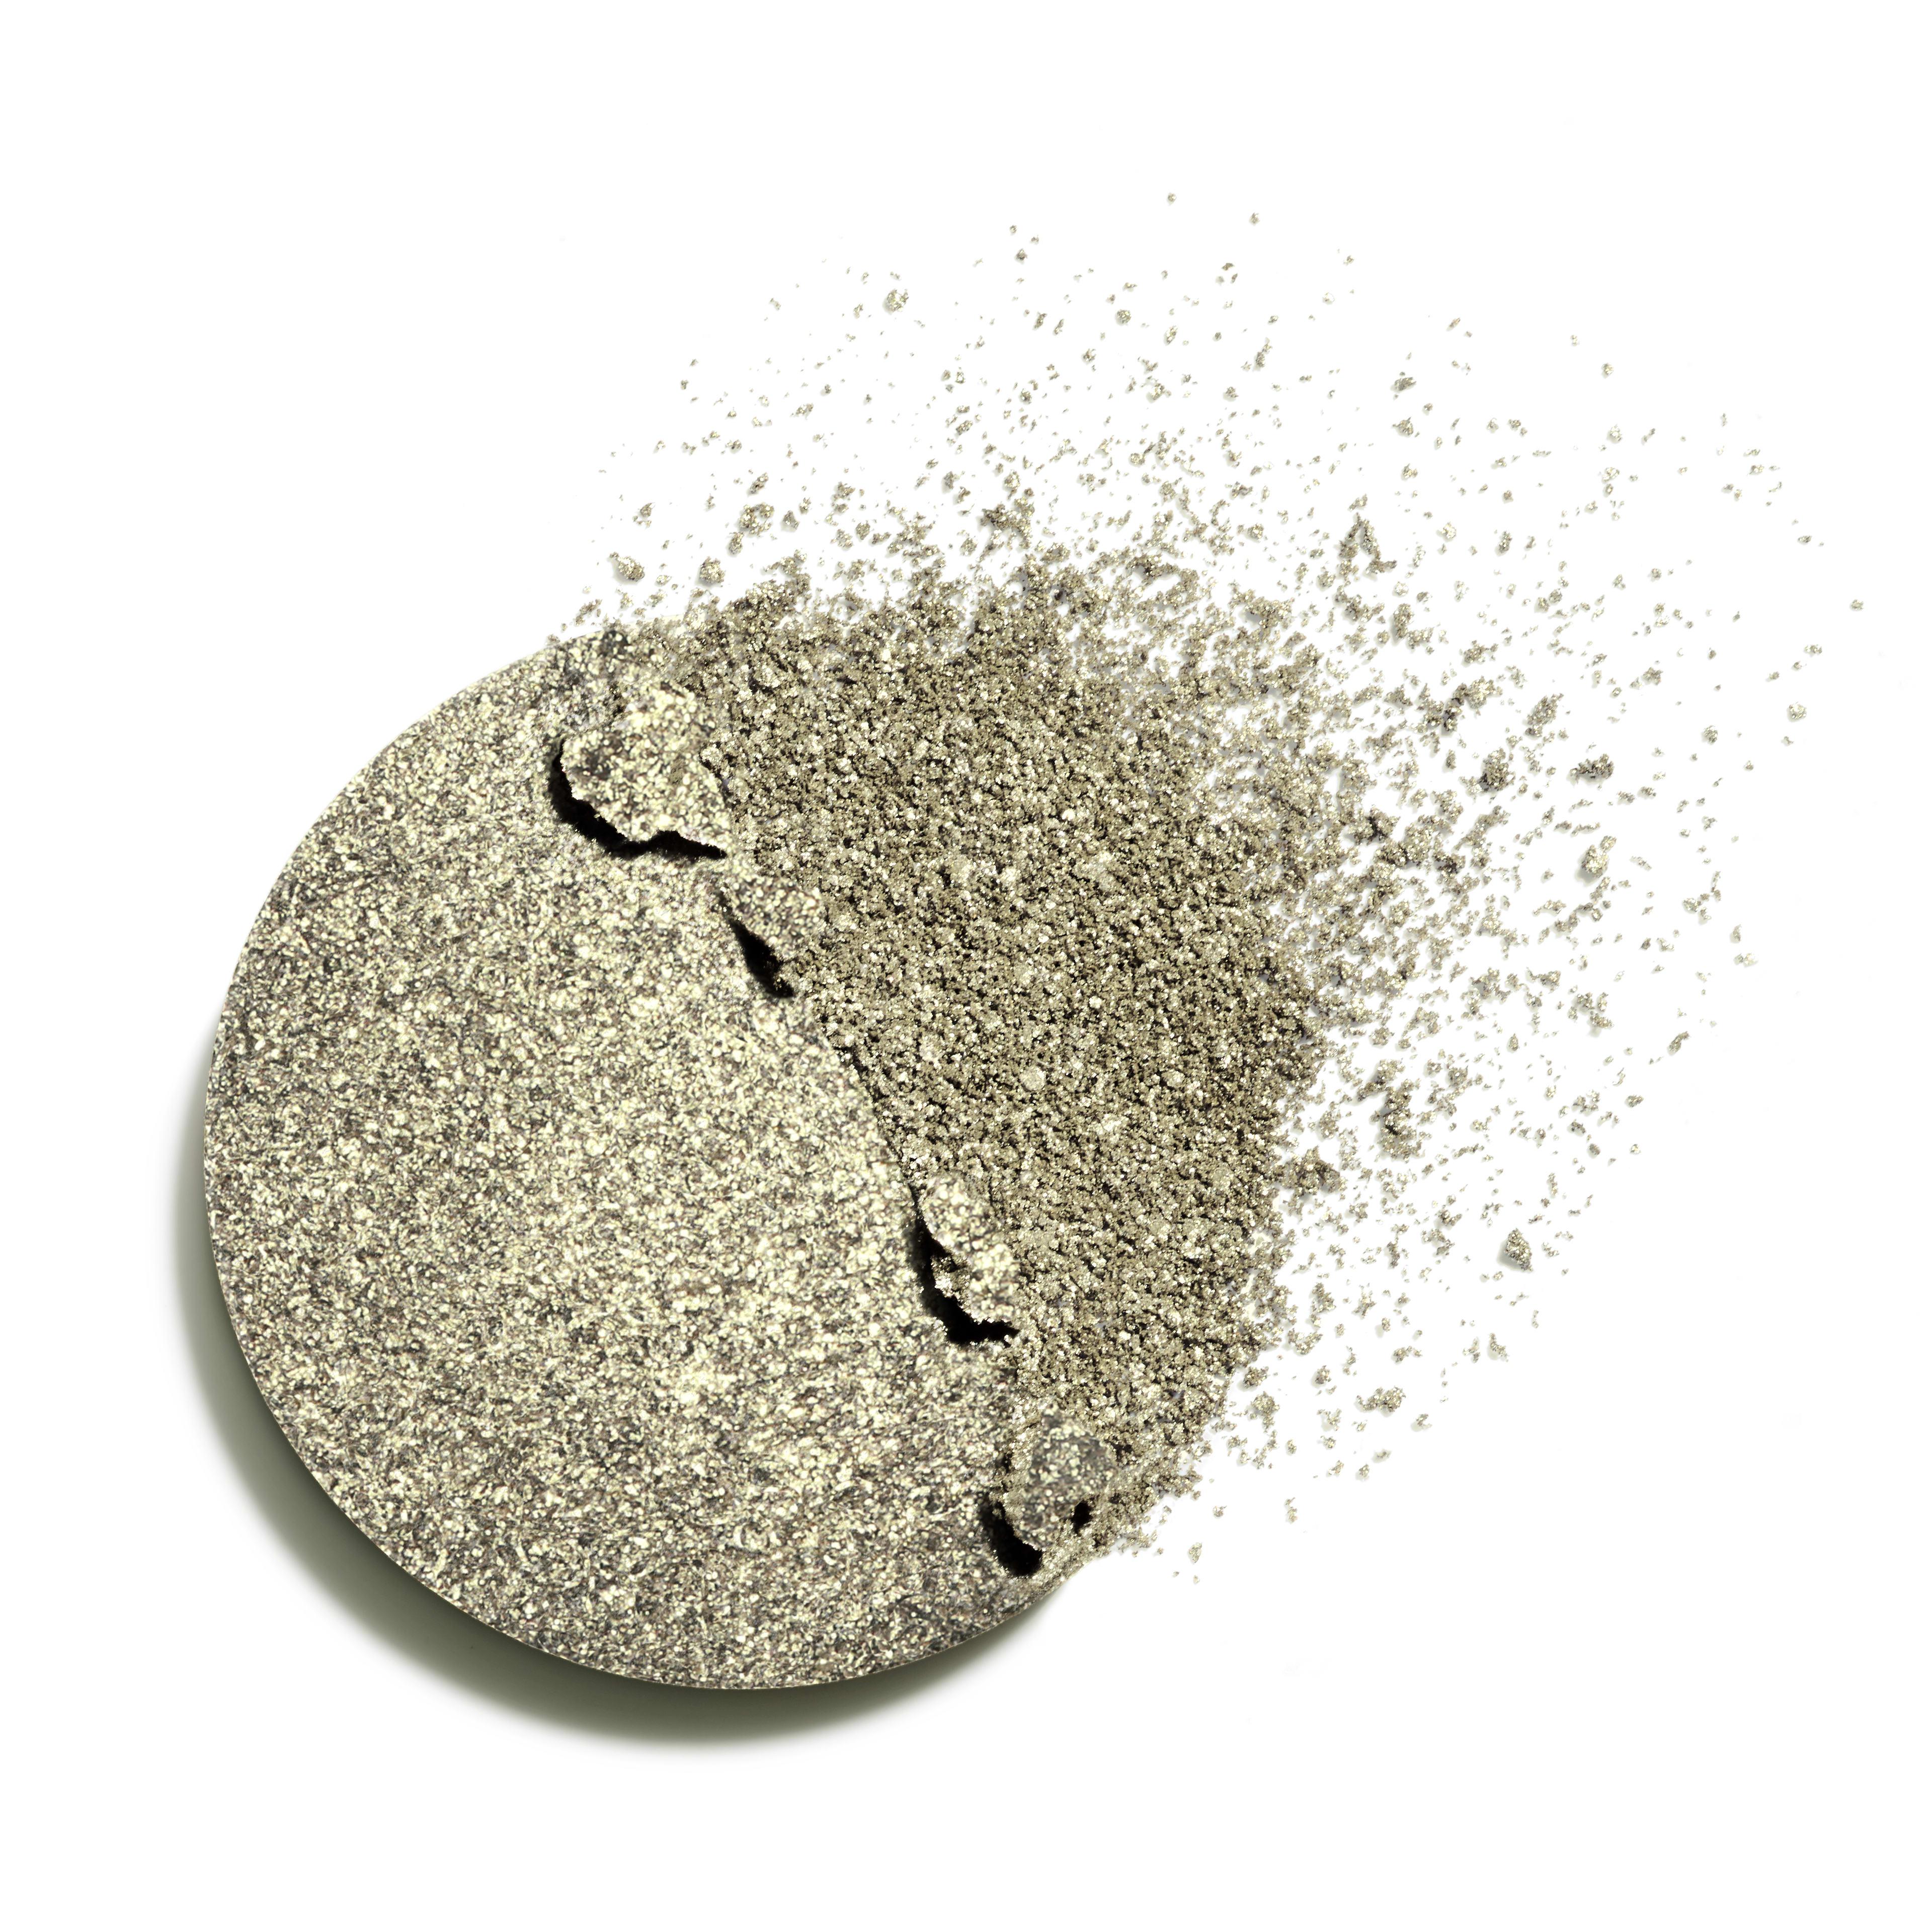 OMBRE PREMIÈRE TOP COAT - makeup - 2.2g - 基本質地視圖